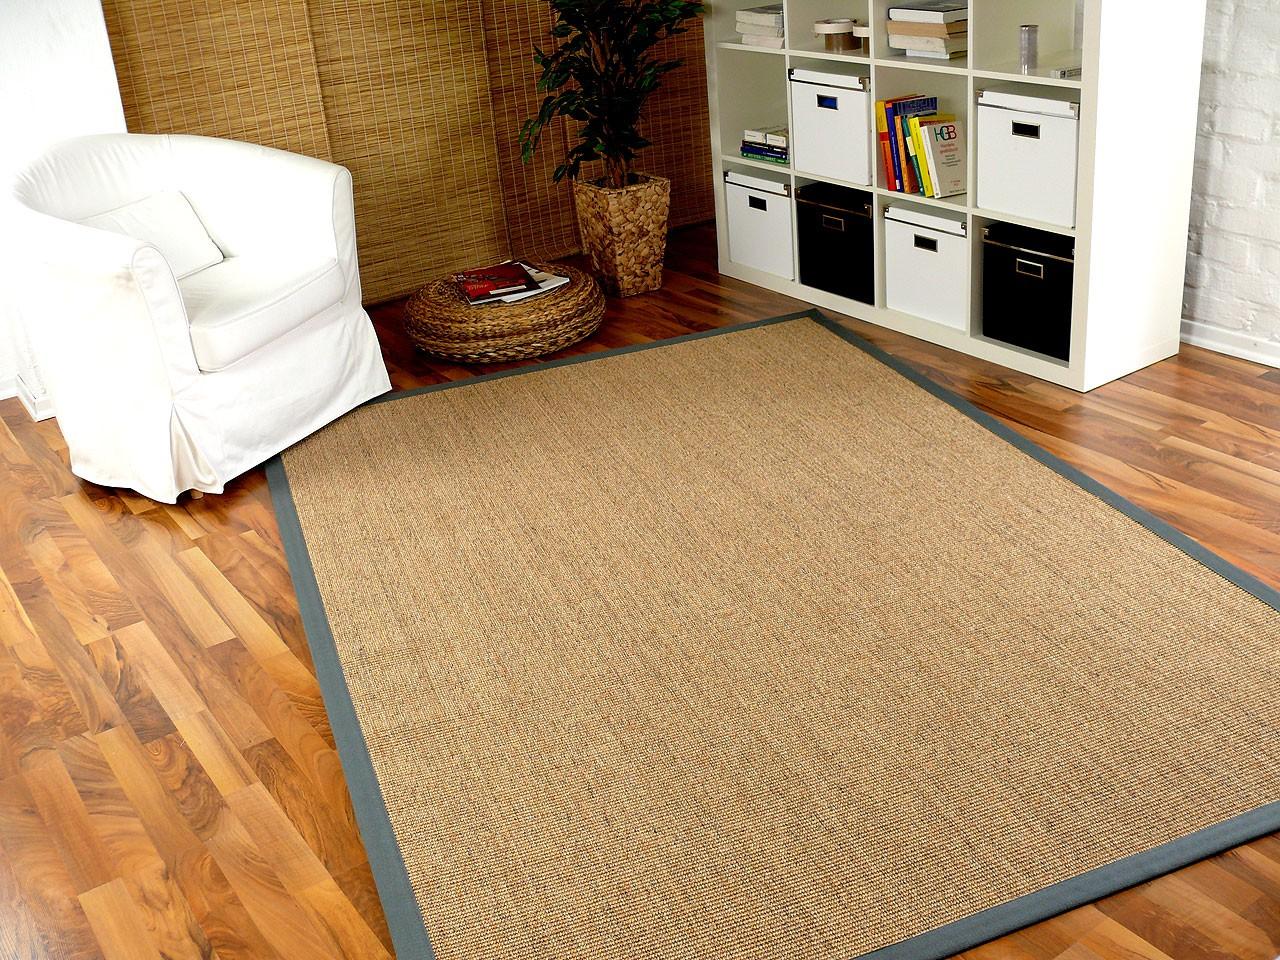 sisal astra natur teppich nuss bord re grau teppiche sisal. Black Bedroom Furniture Sets. Home Design Ideas